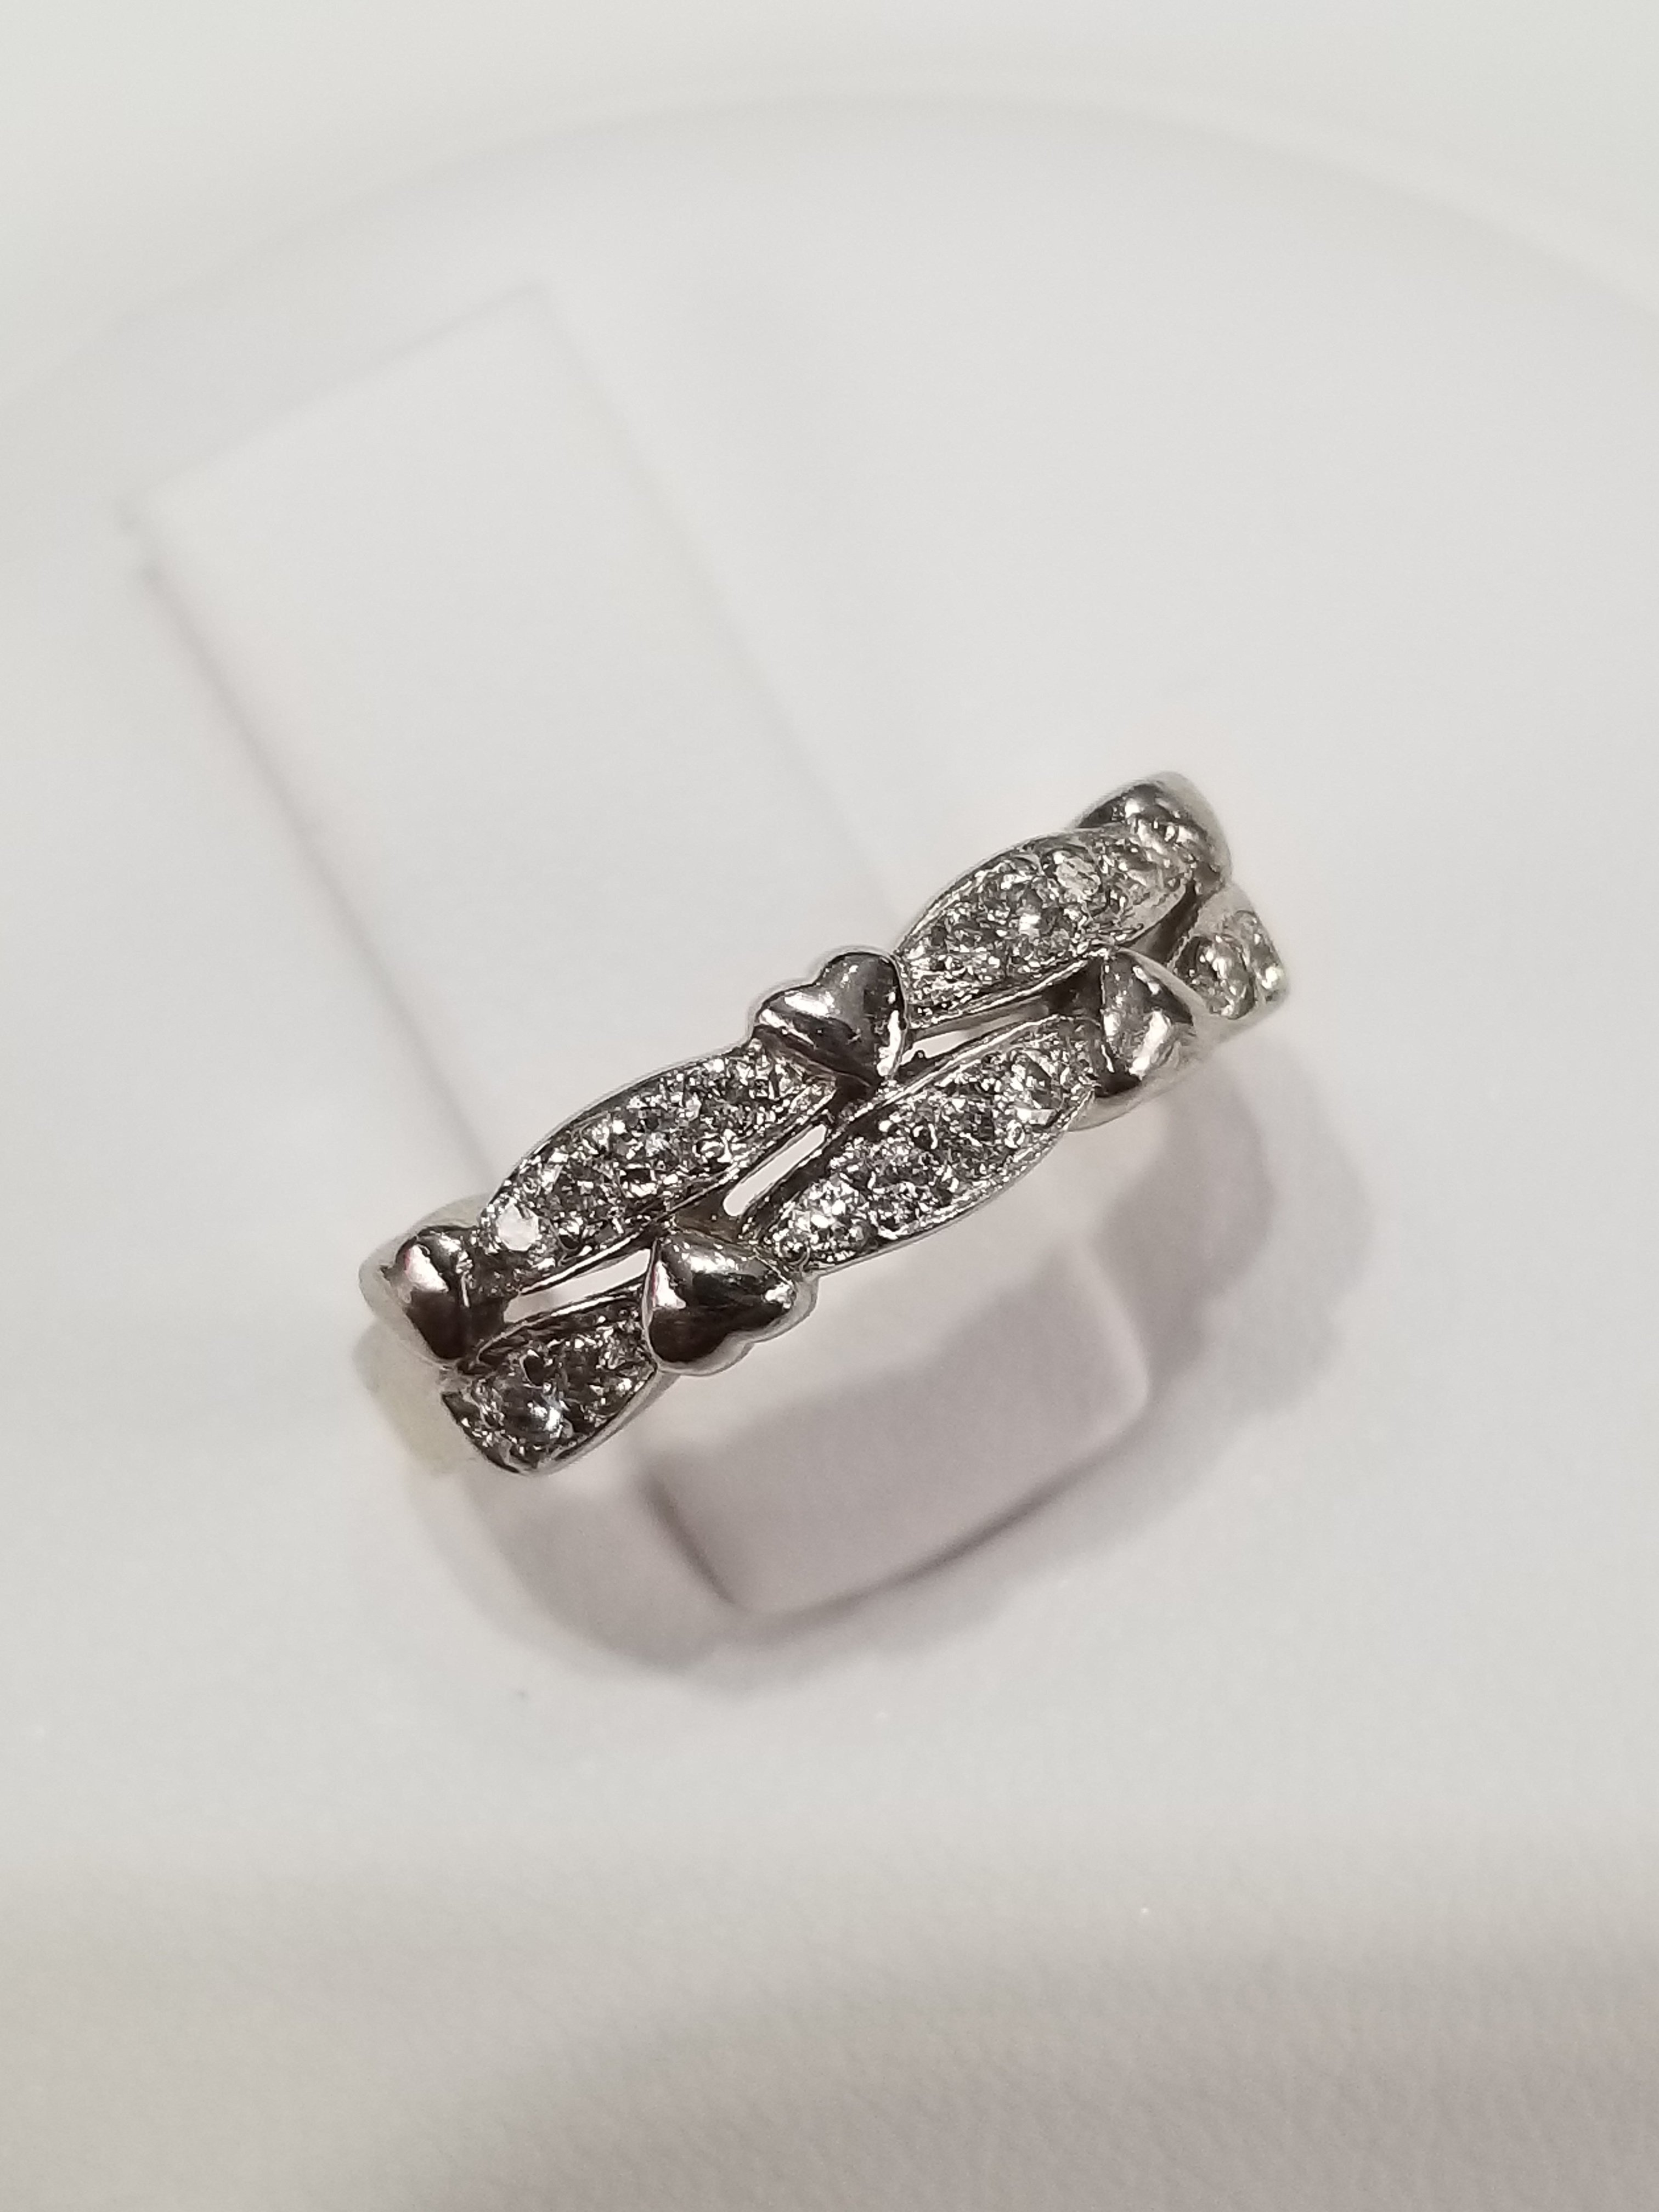 14K White Gold Diamonds: 0.25ct Regular Price $1850 SALE $495 Ref: GP373